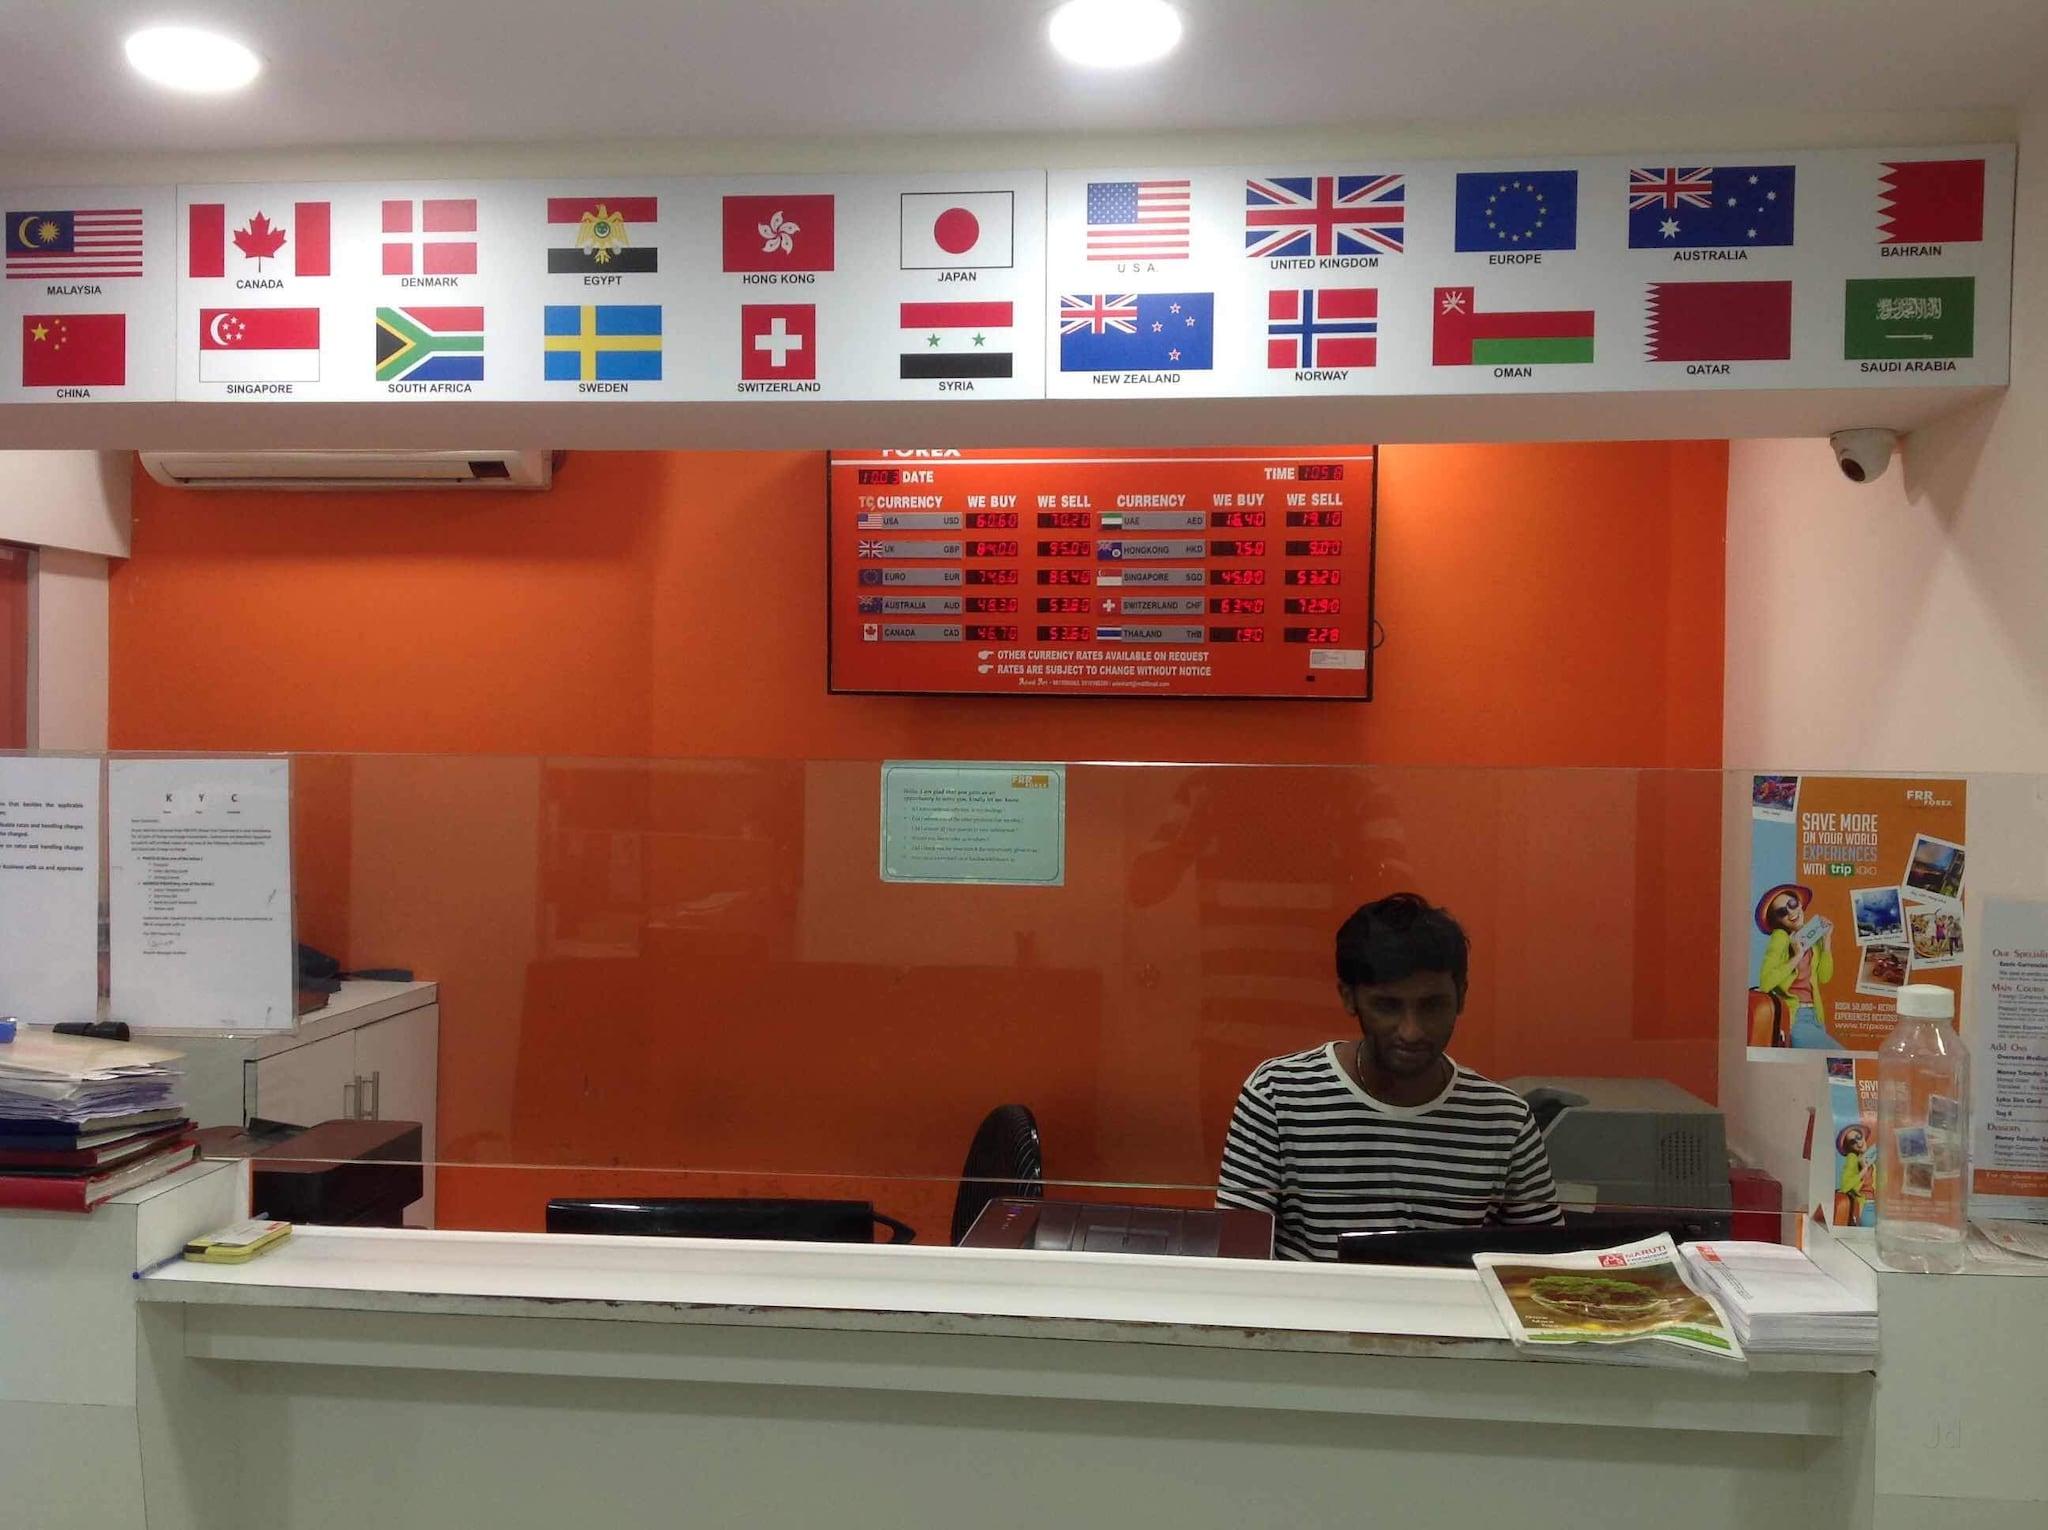 Frr forex pvt ltd navsari postal code tradewest forex review sites